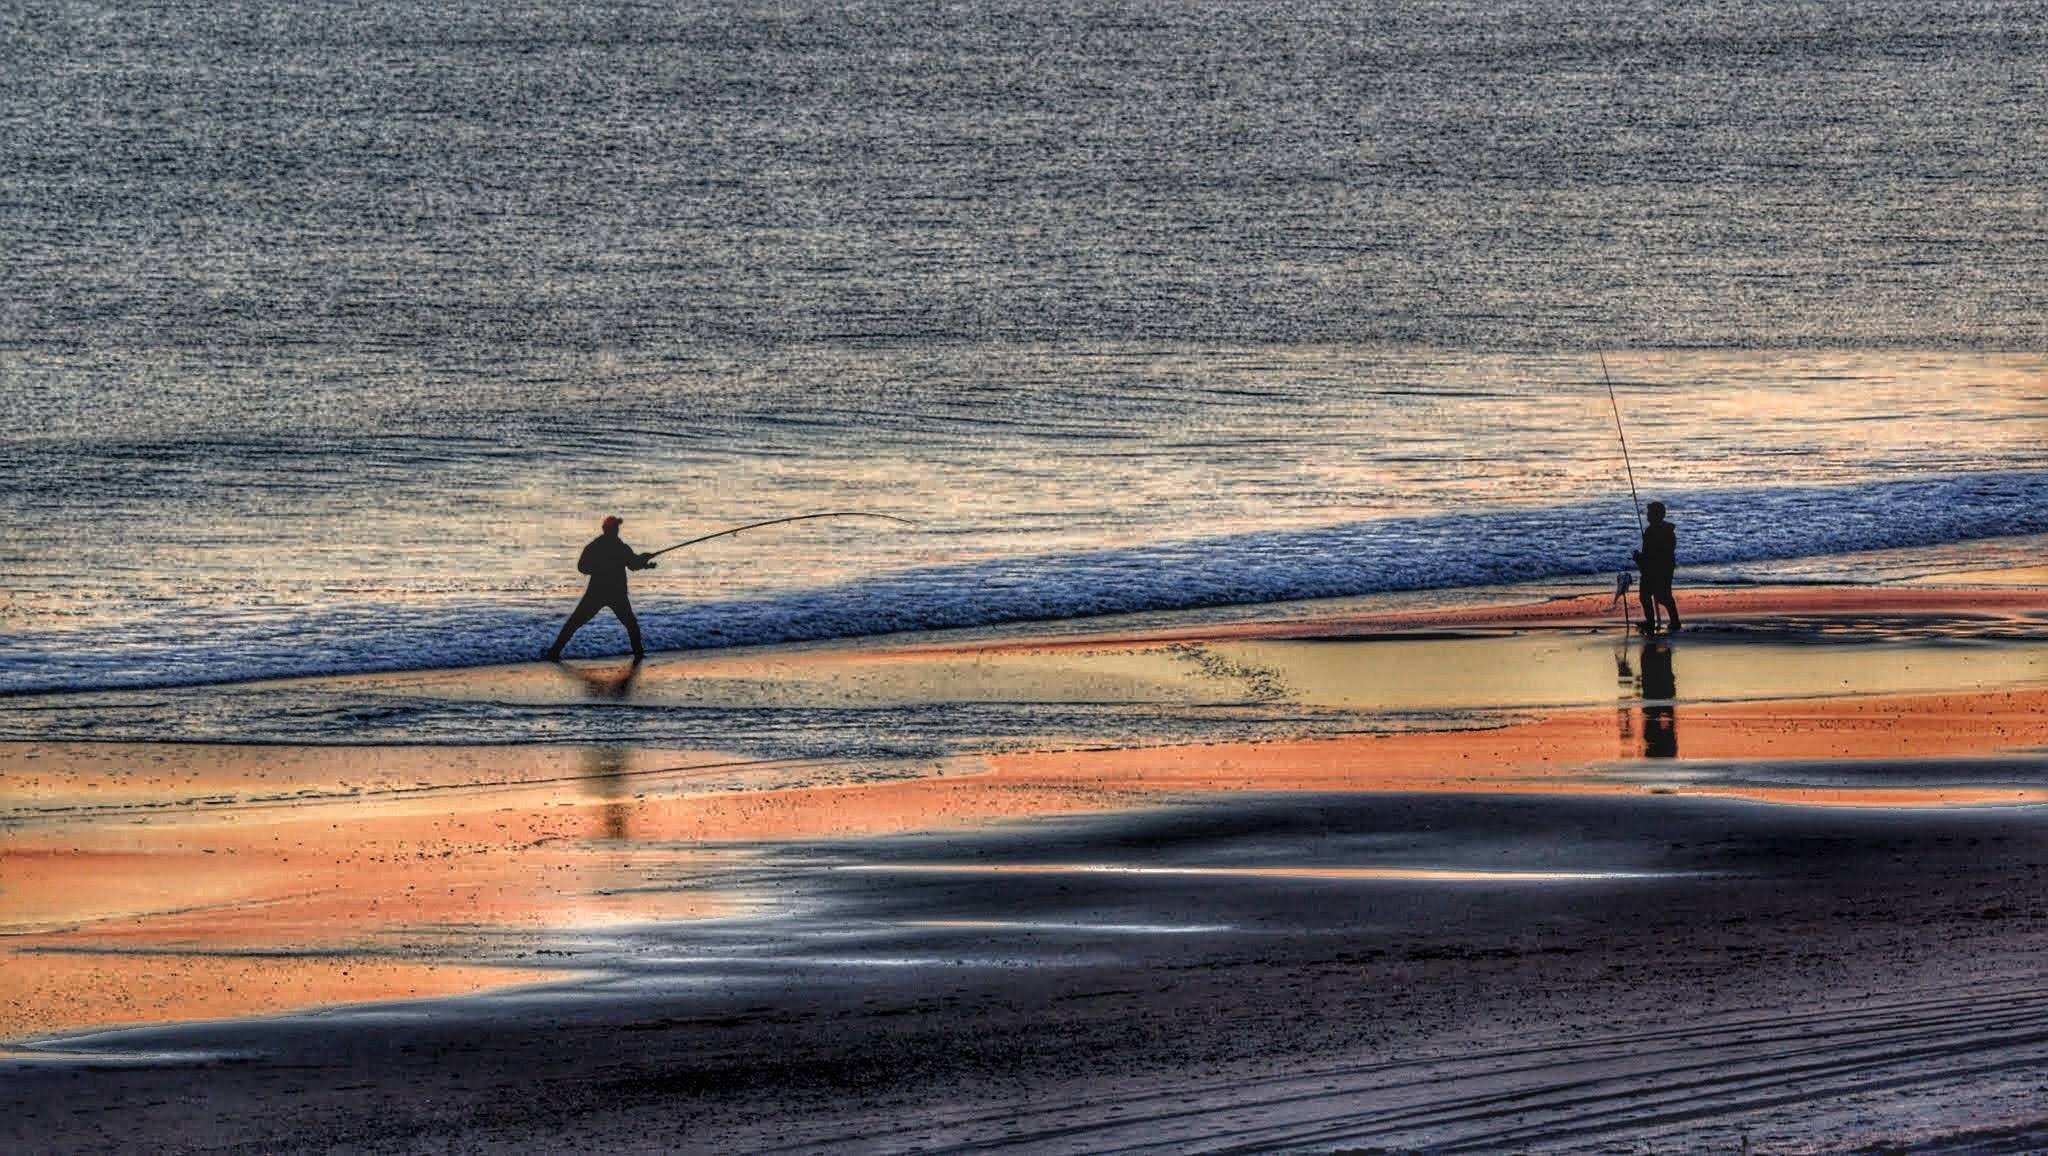 Surf Casting, Emerald Isle, NC